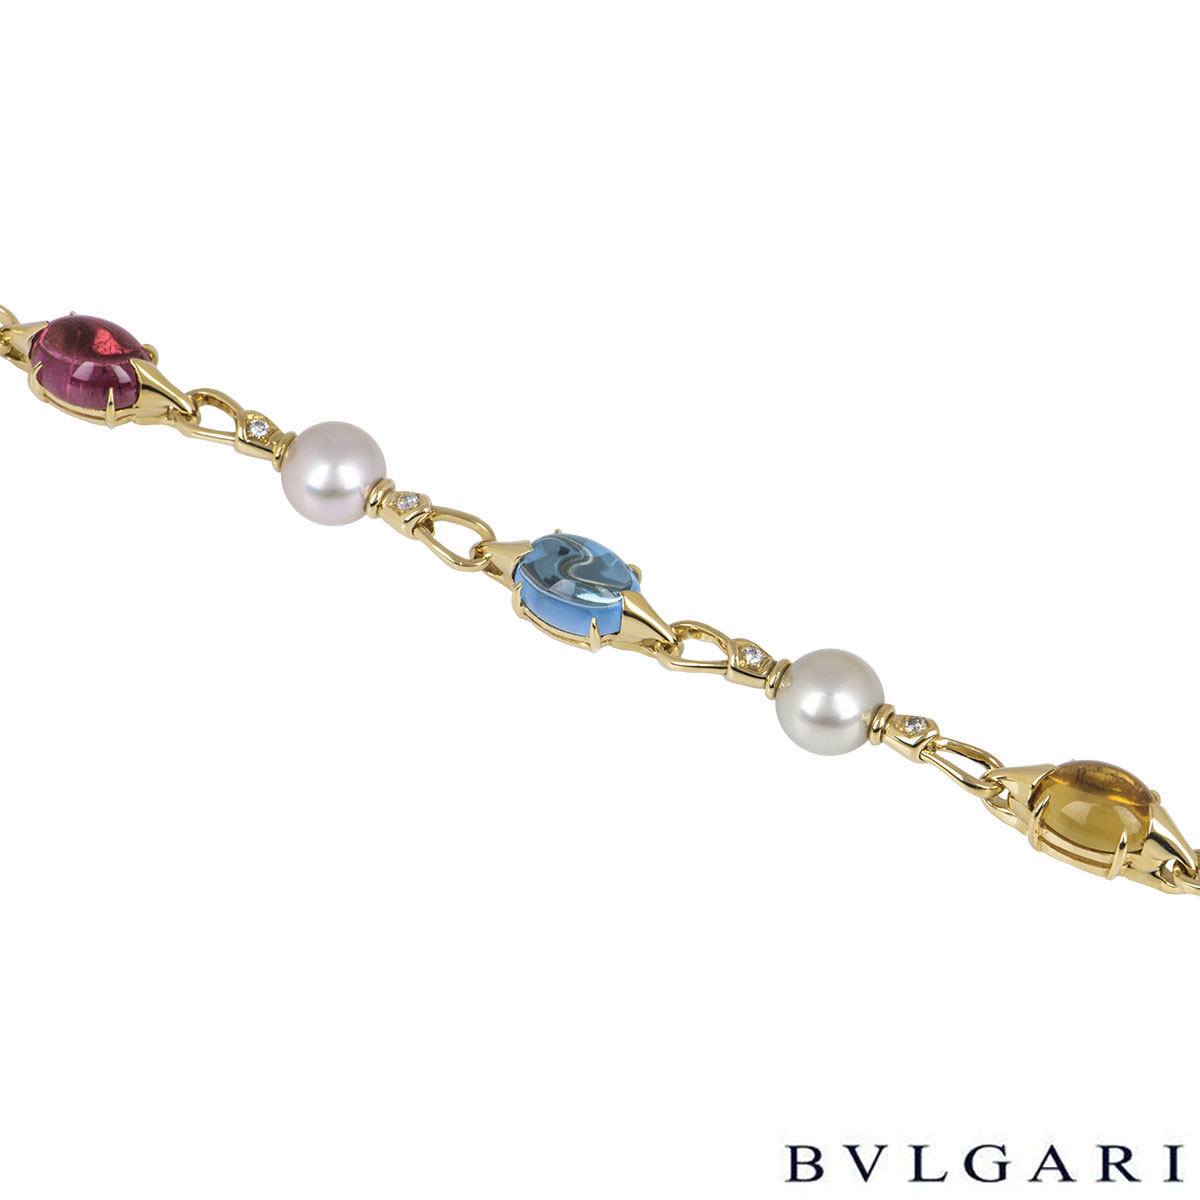 Bvlgari Yellow Gold Pearl & Multi-Gem Allegra Bracelet